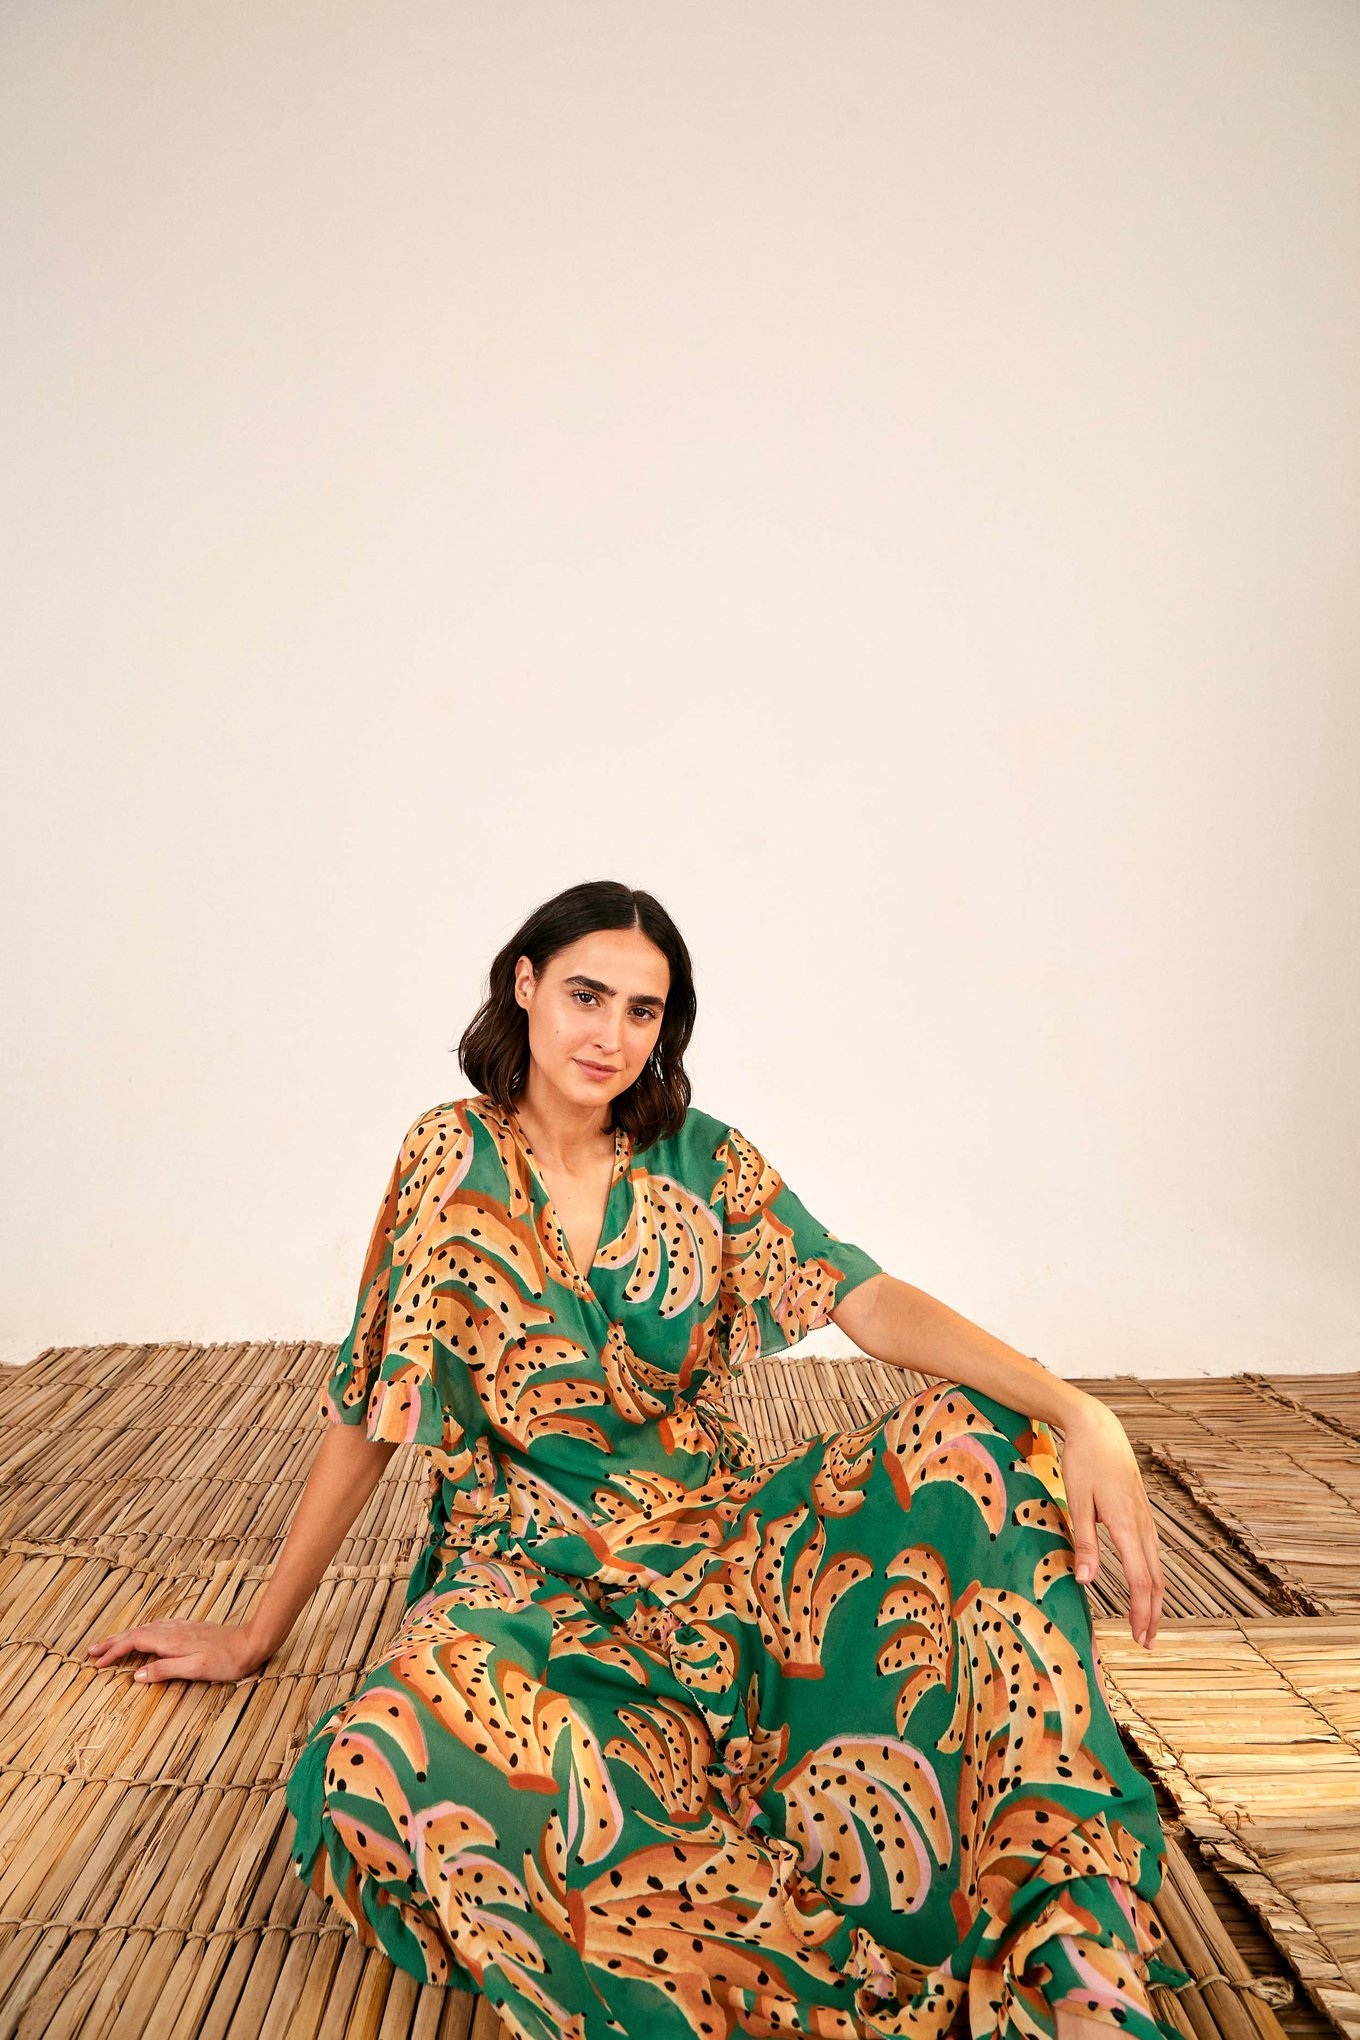 Green Raining Bananas Maxi Wrap Dress $275